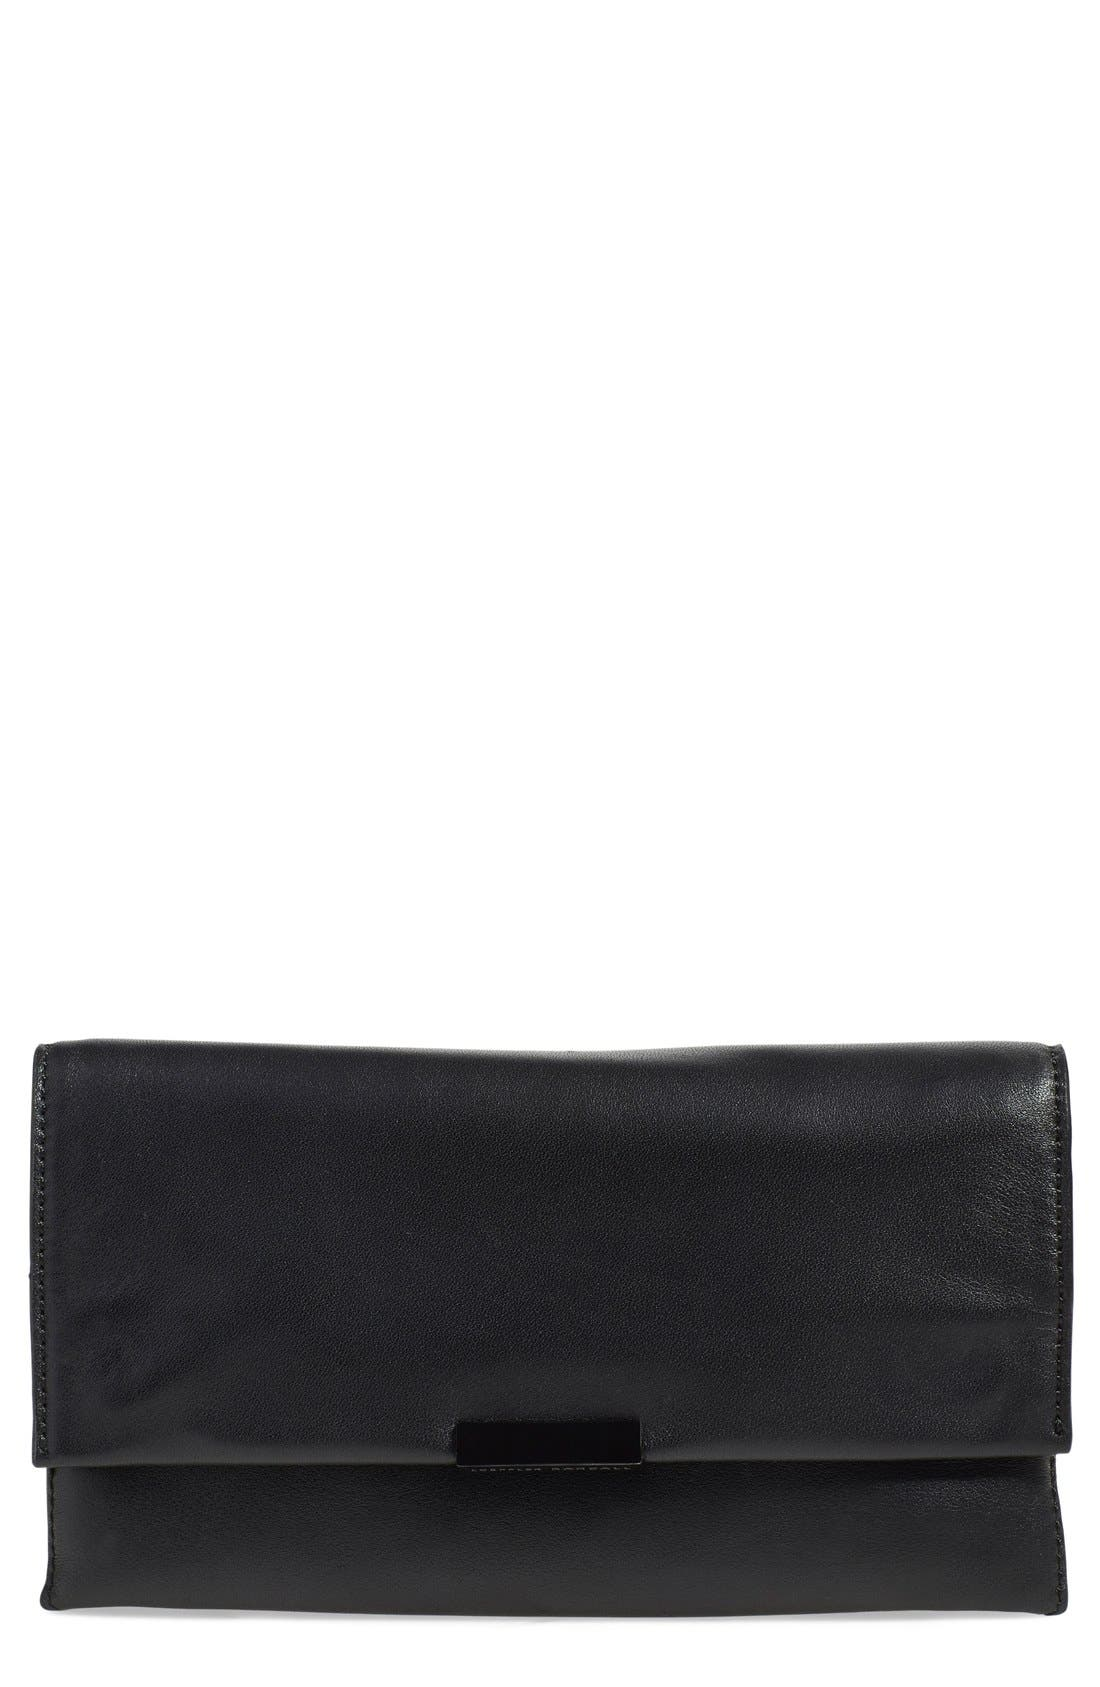 Leather Accordion Clutch,                         Main,                         color, Black